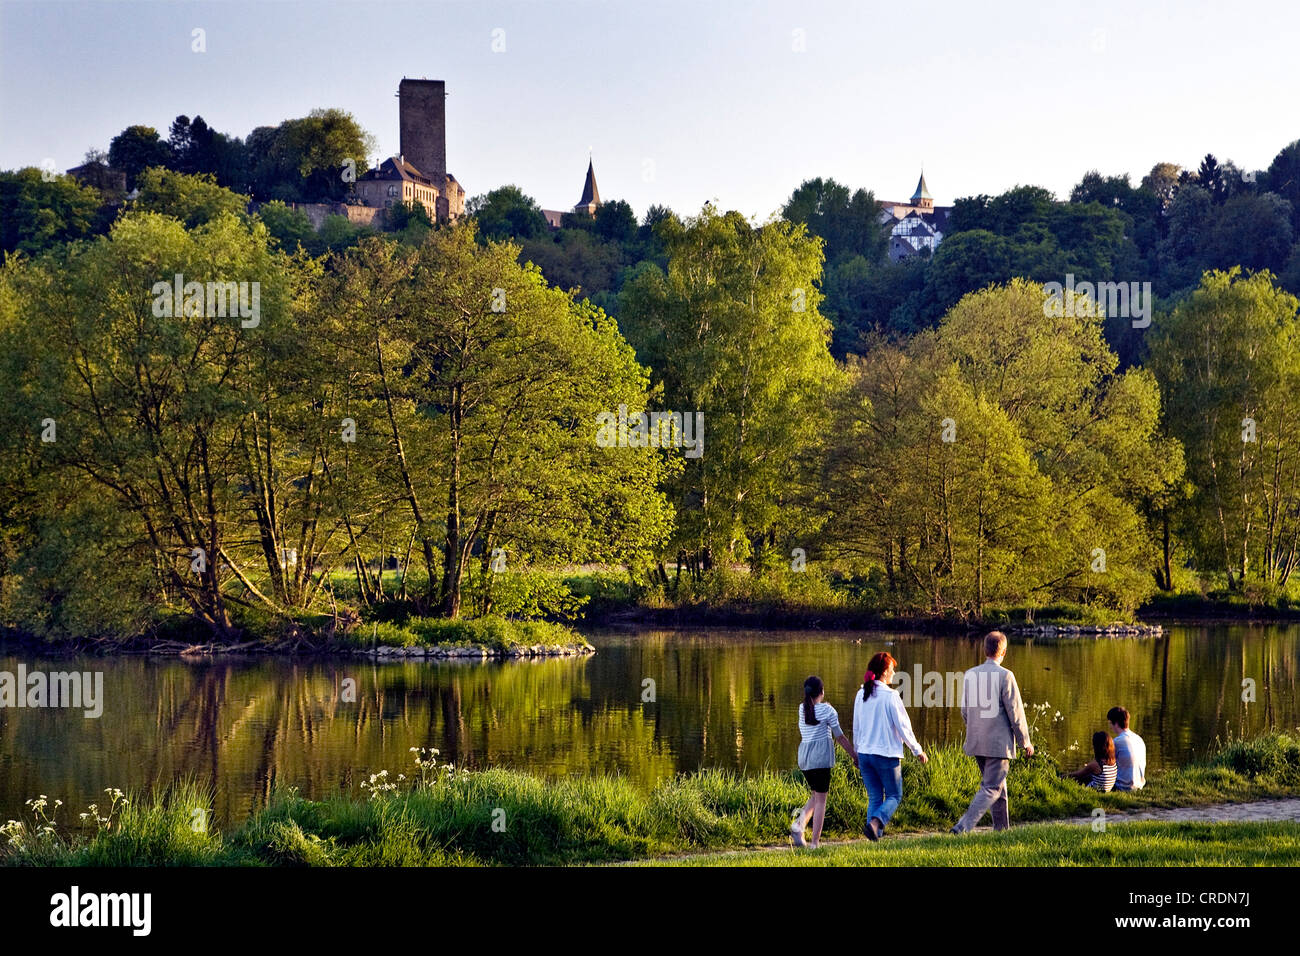 family near the Ruhr river looking towards Hattingen Blankenstein Castle, Germany, North Rhine-Westphalia, Ruhr Stock Photo